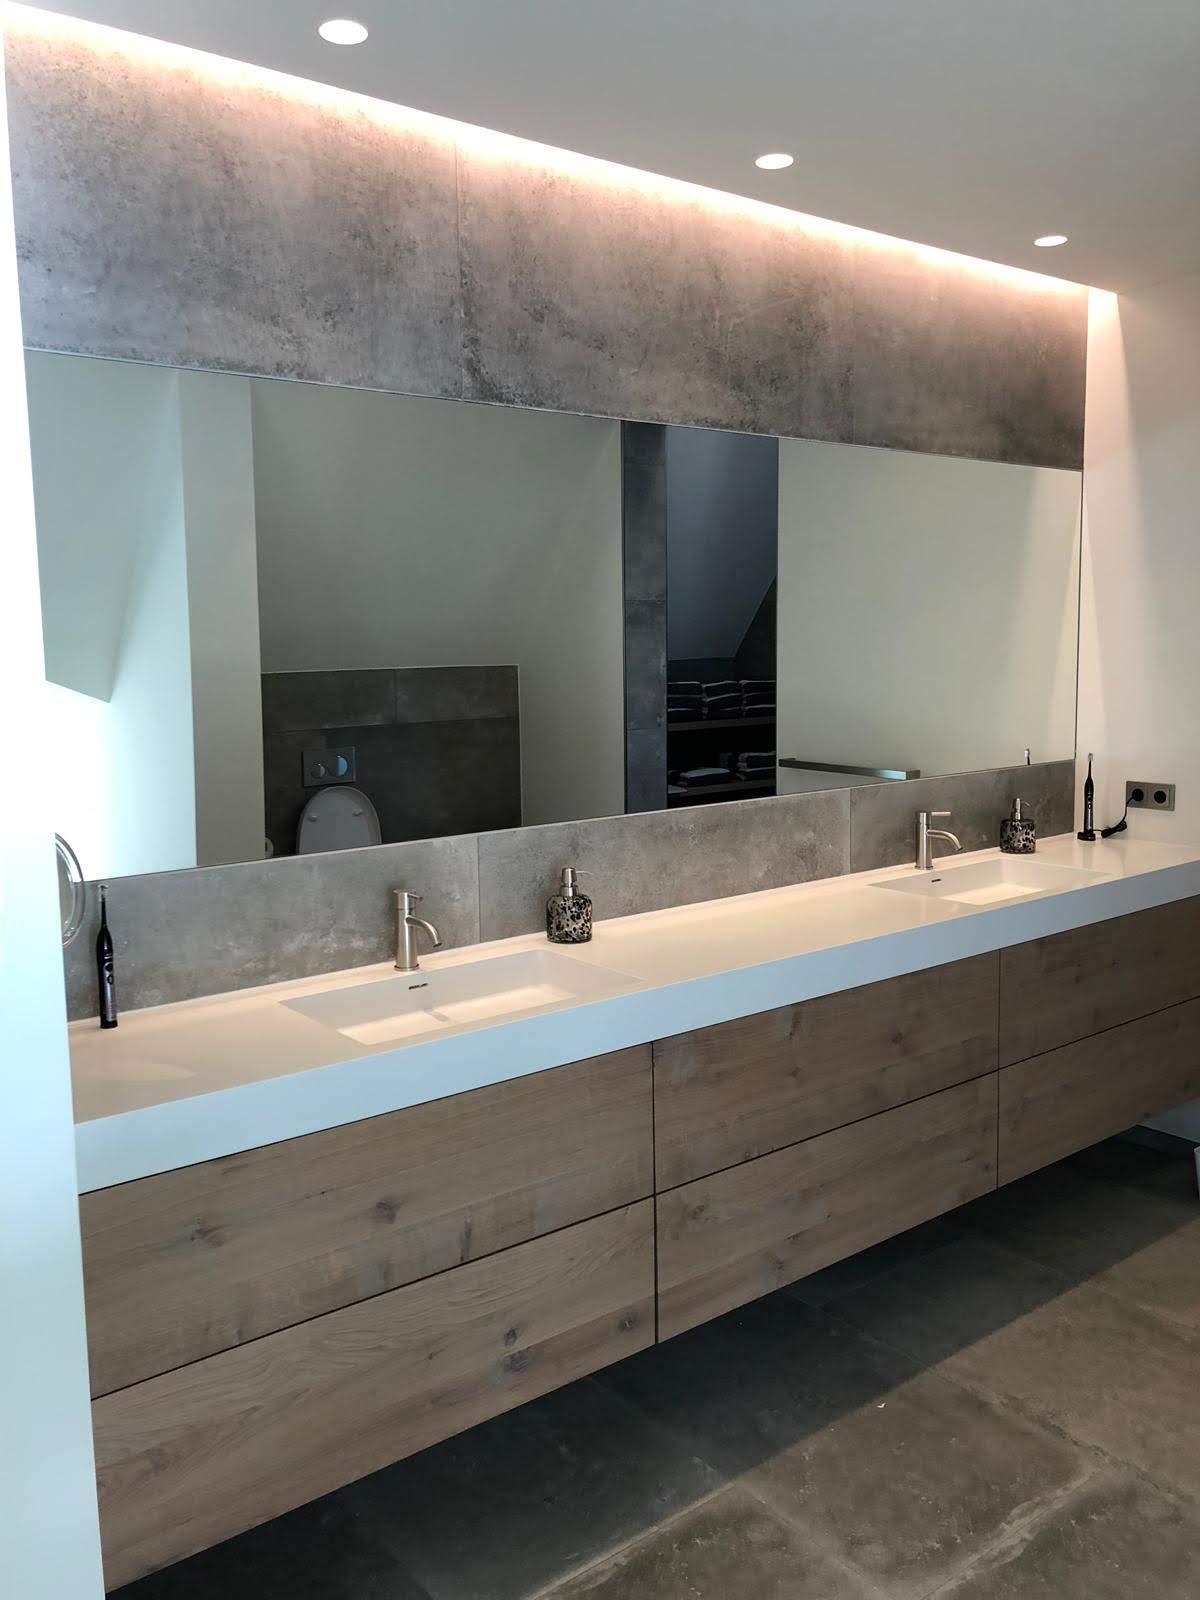 Grote spiegel in de badkamer